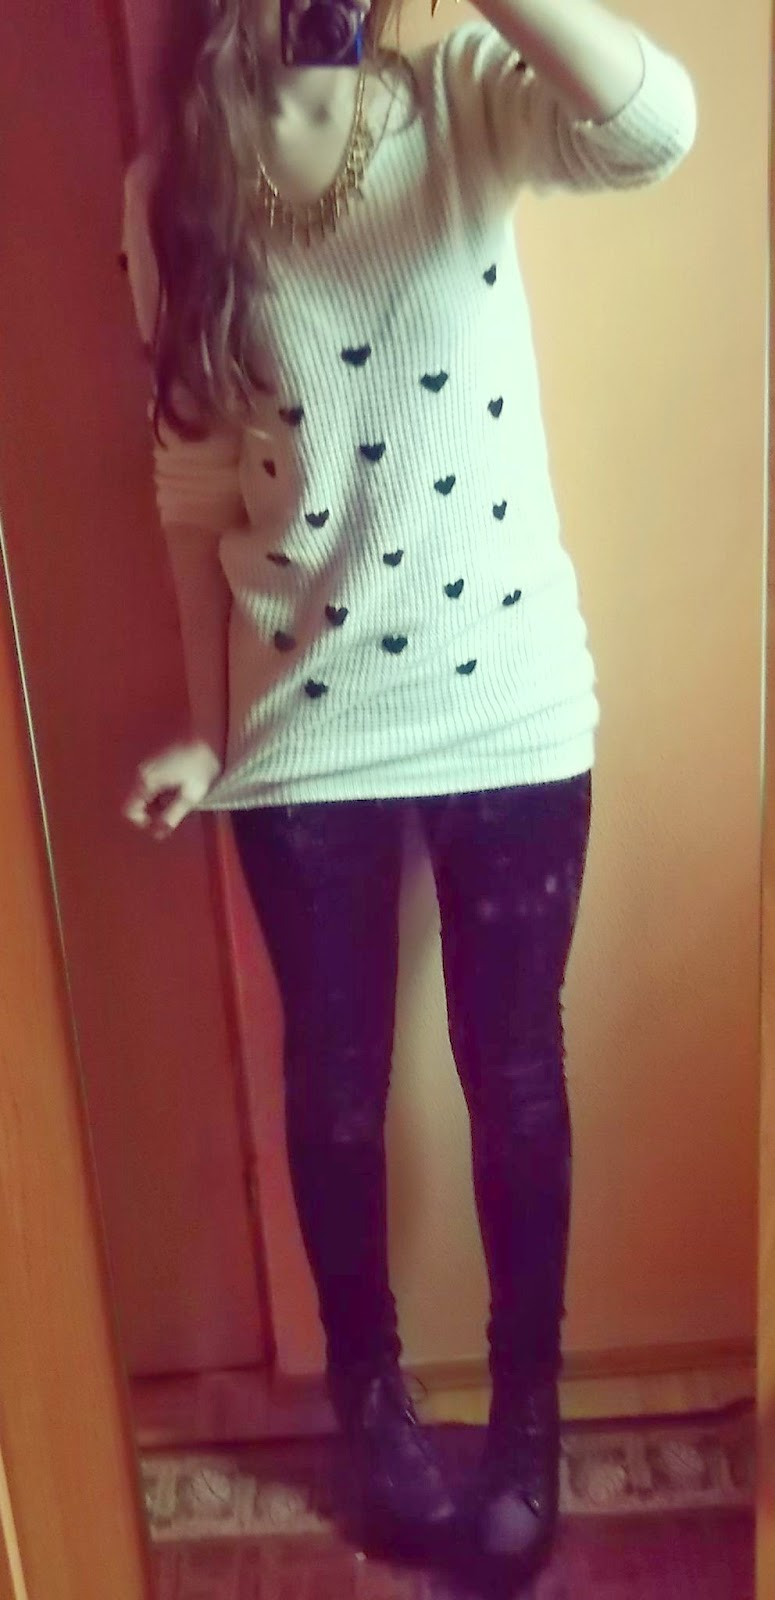 OOTD: sweterek w serduszka+legginsy welwetowe